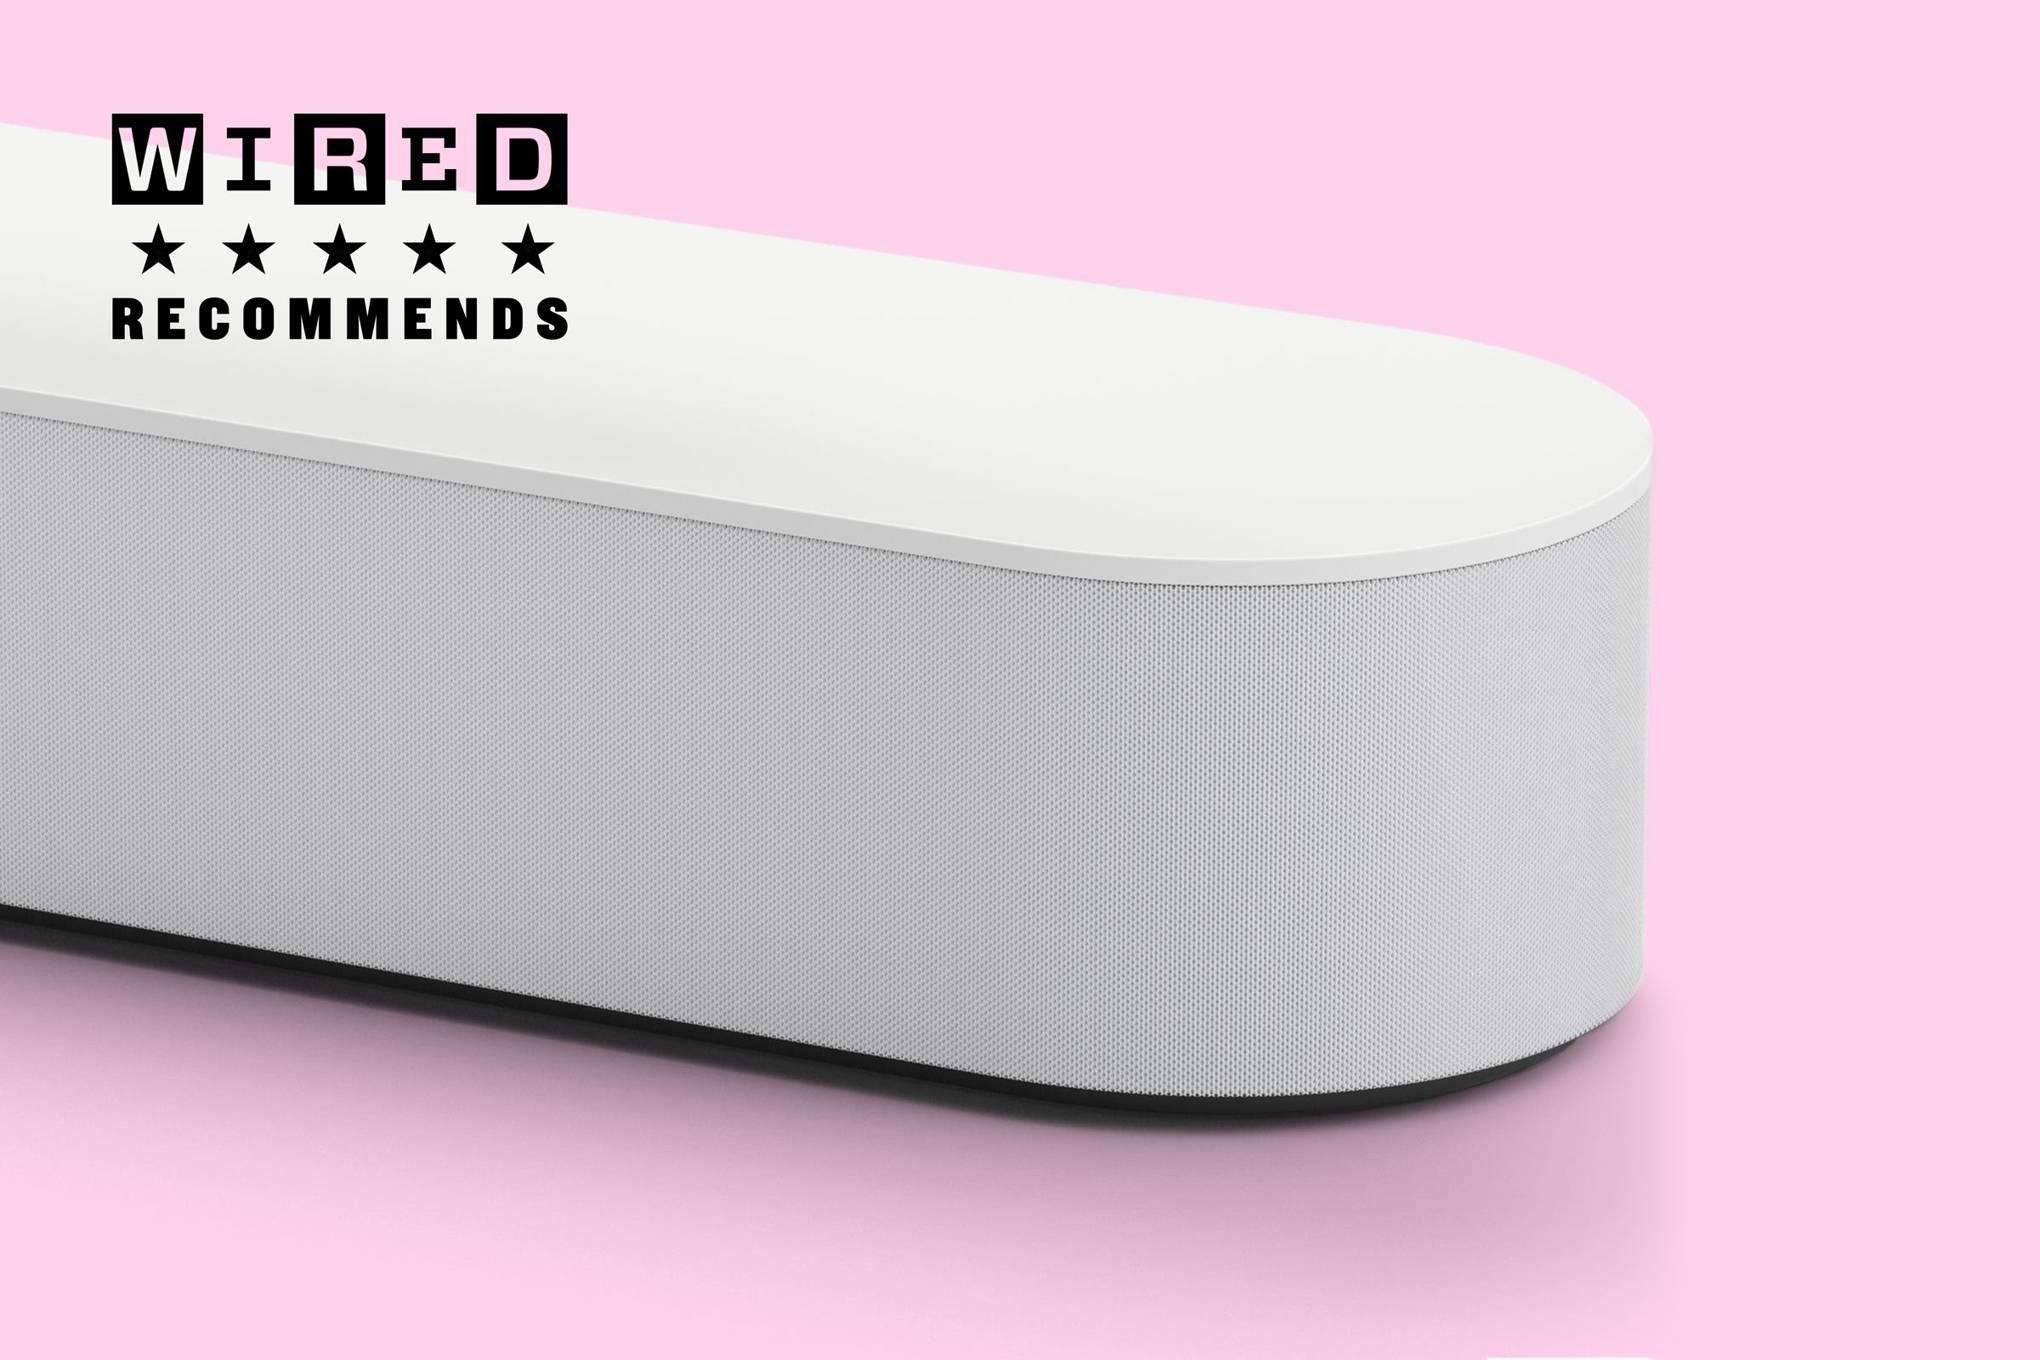 Best Soundbar 2019: The best soundbars for any budget | WIRED UK